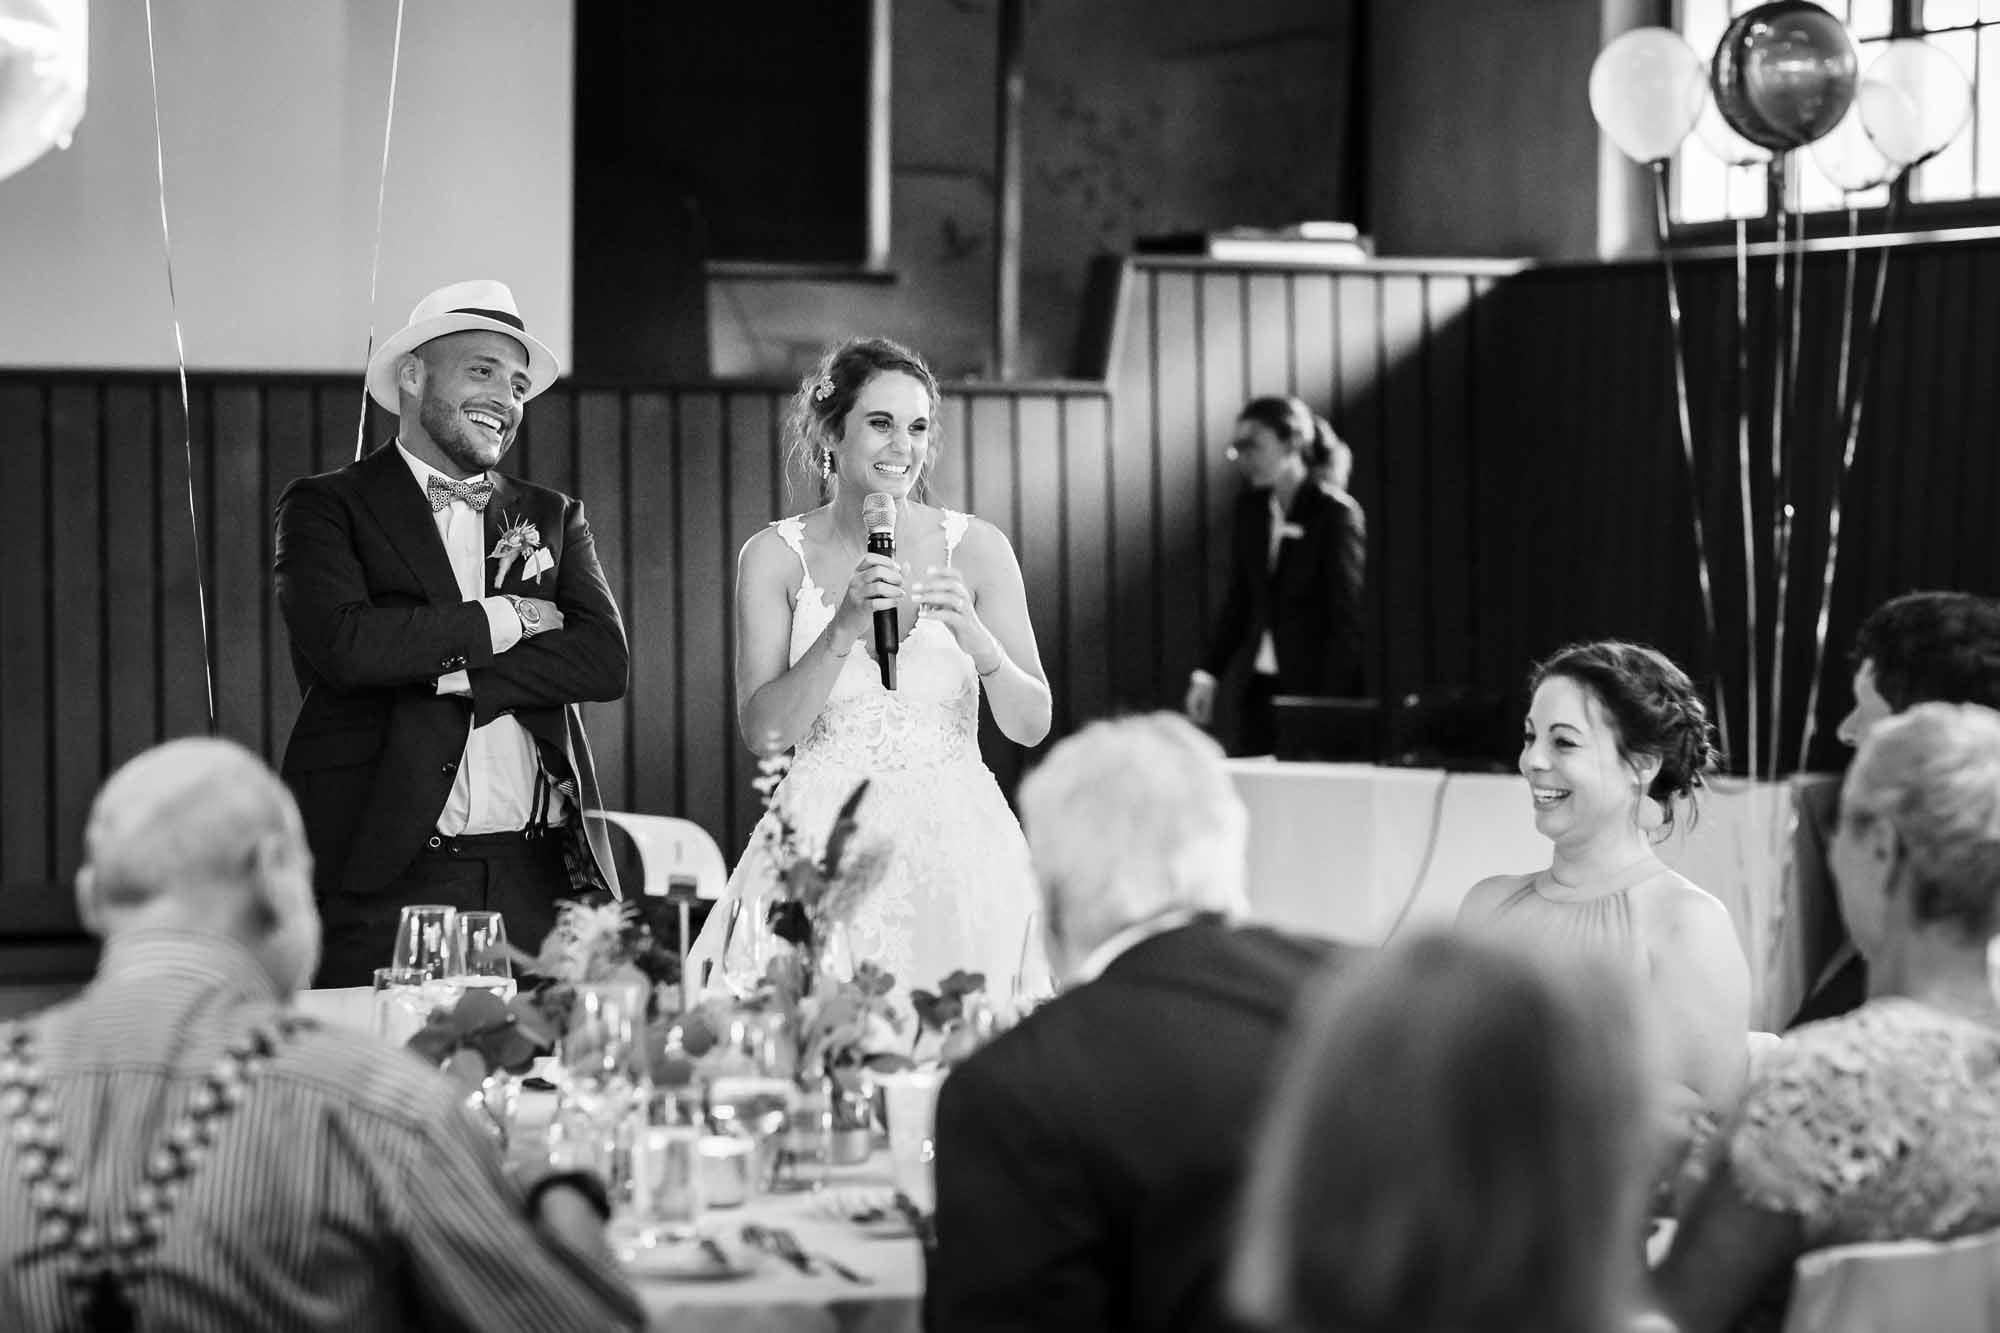 Brautpaar stellt Gäste vor